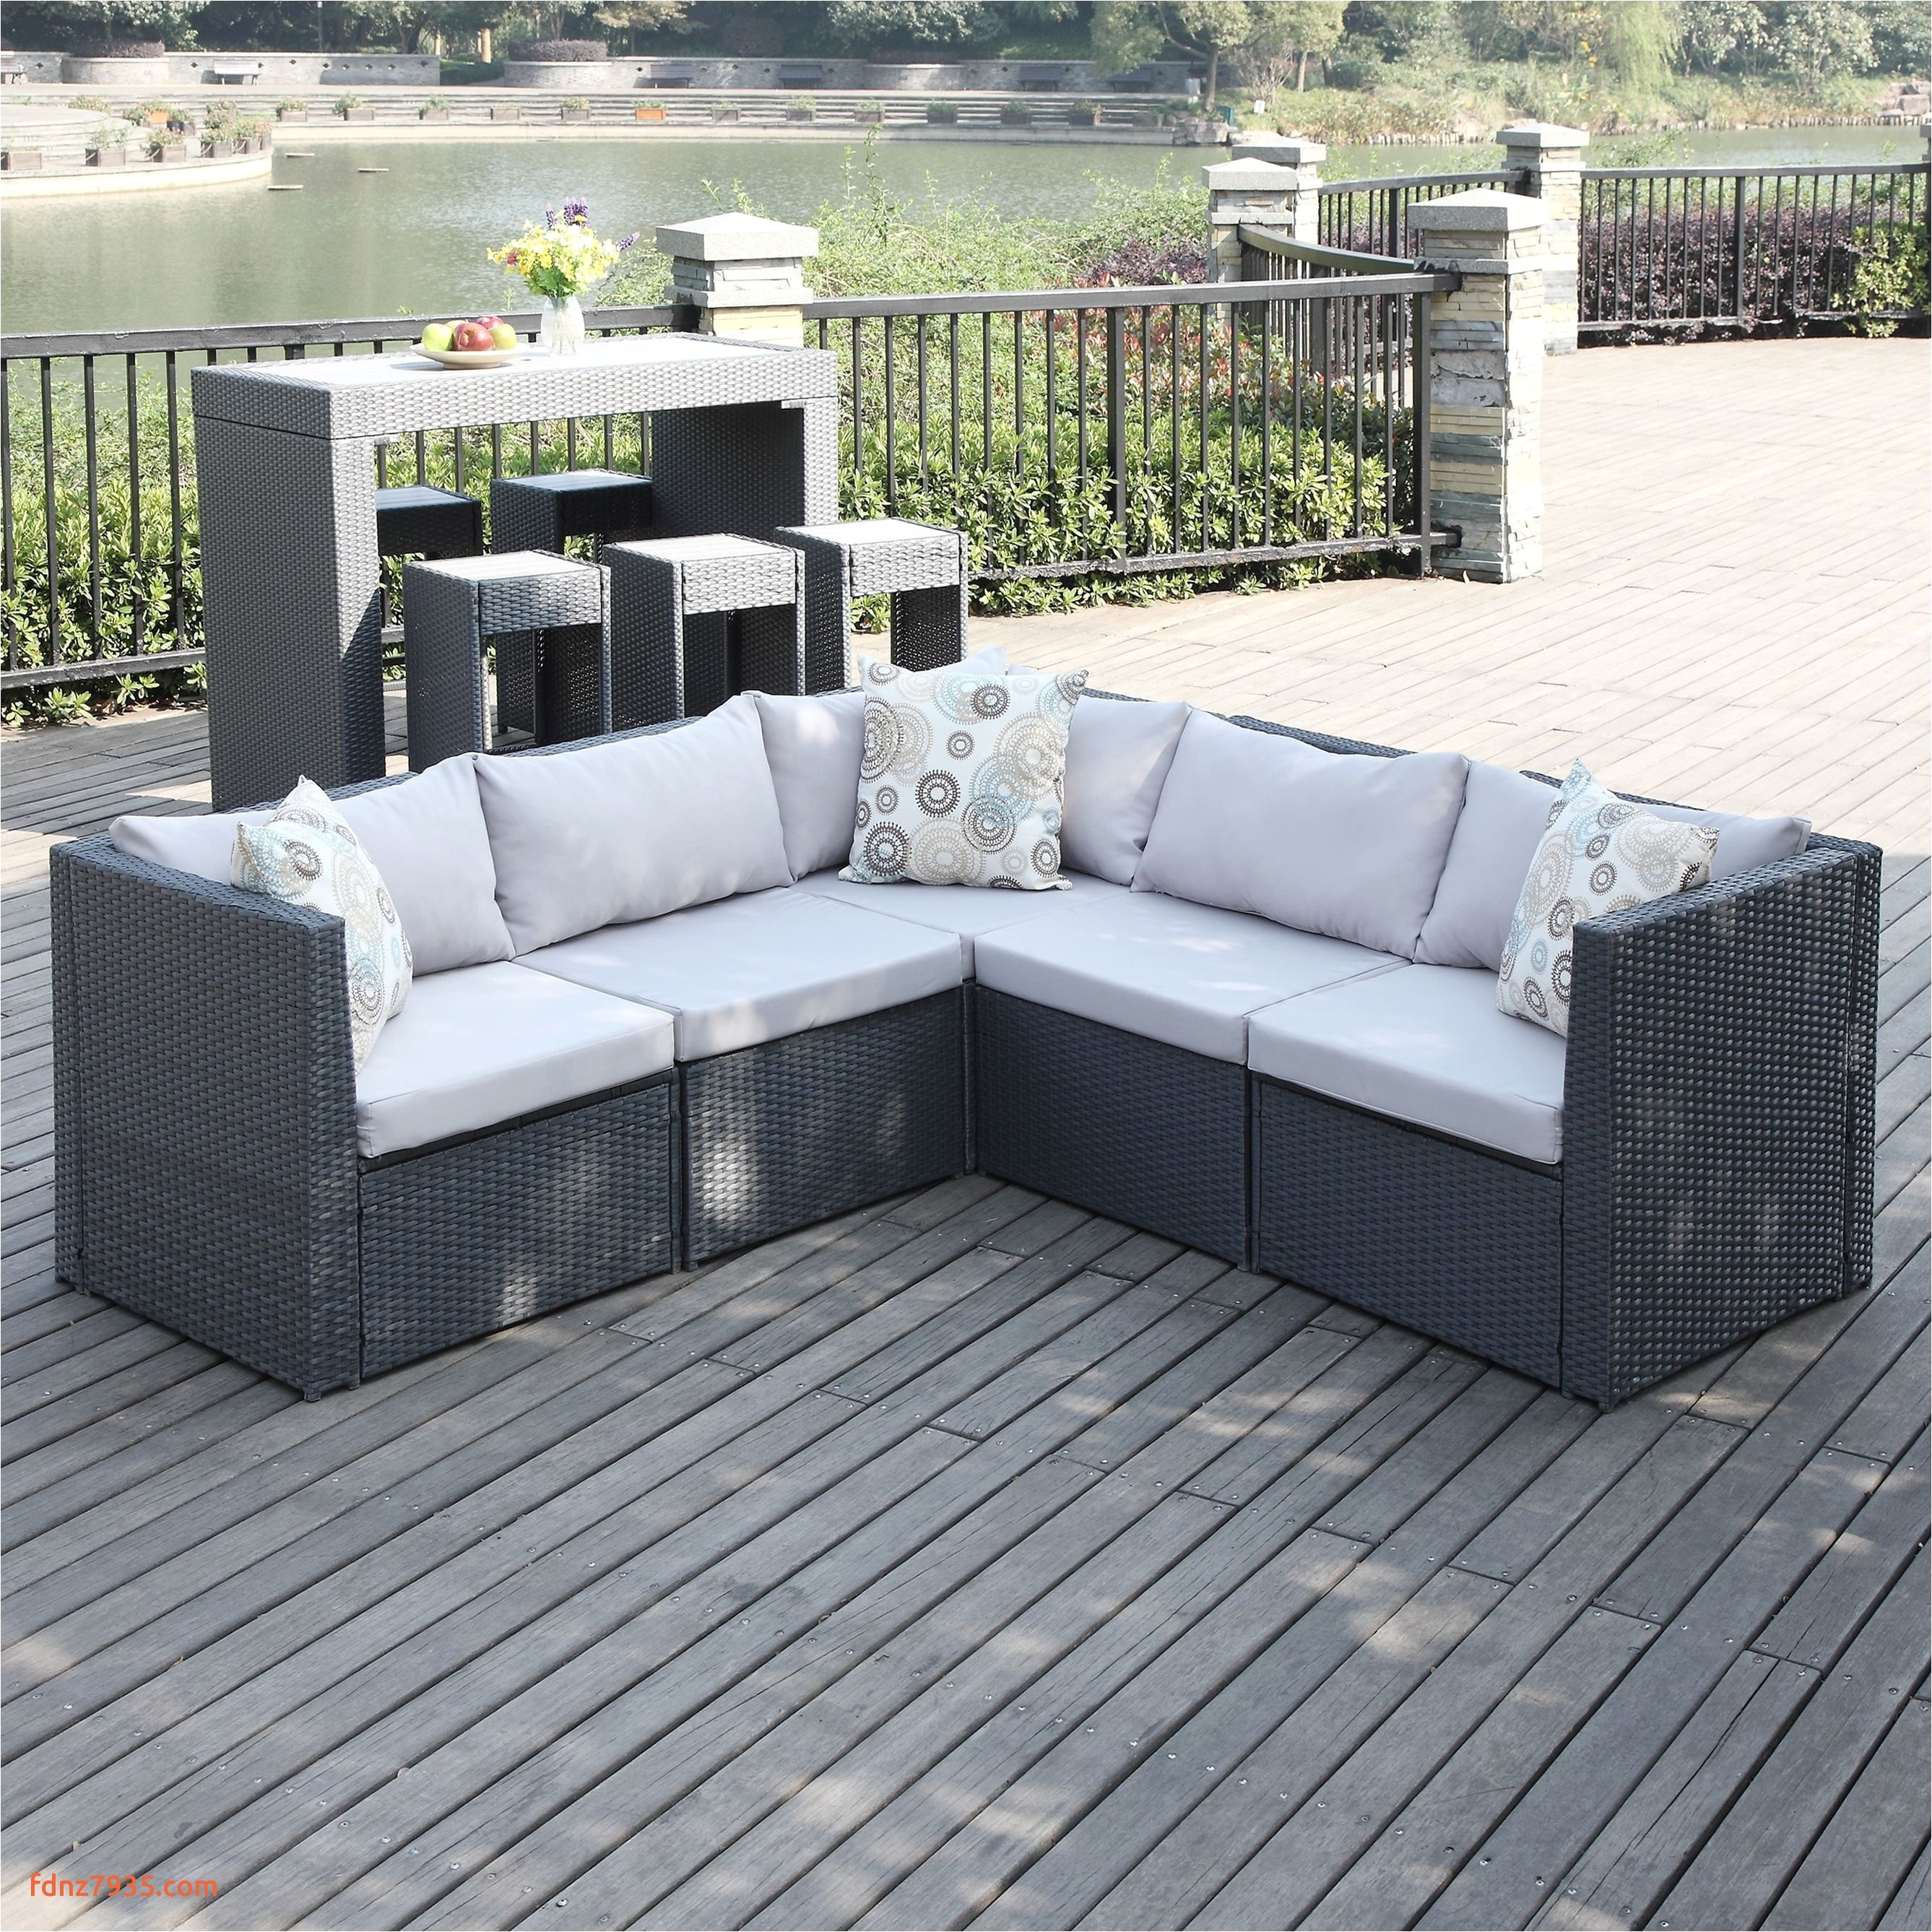 coral coast patio furniture fresh wicker outdoor sofa 0d patio